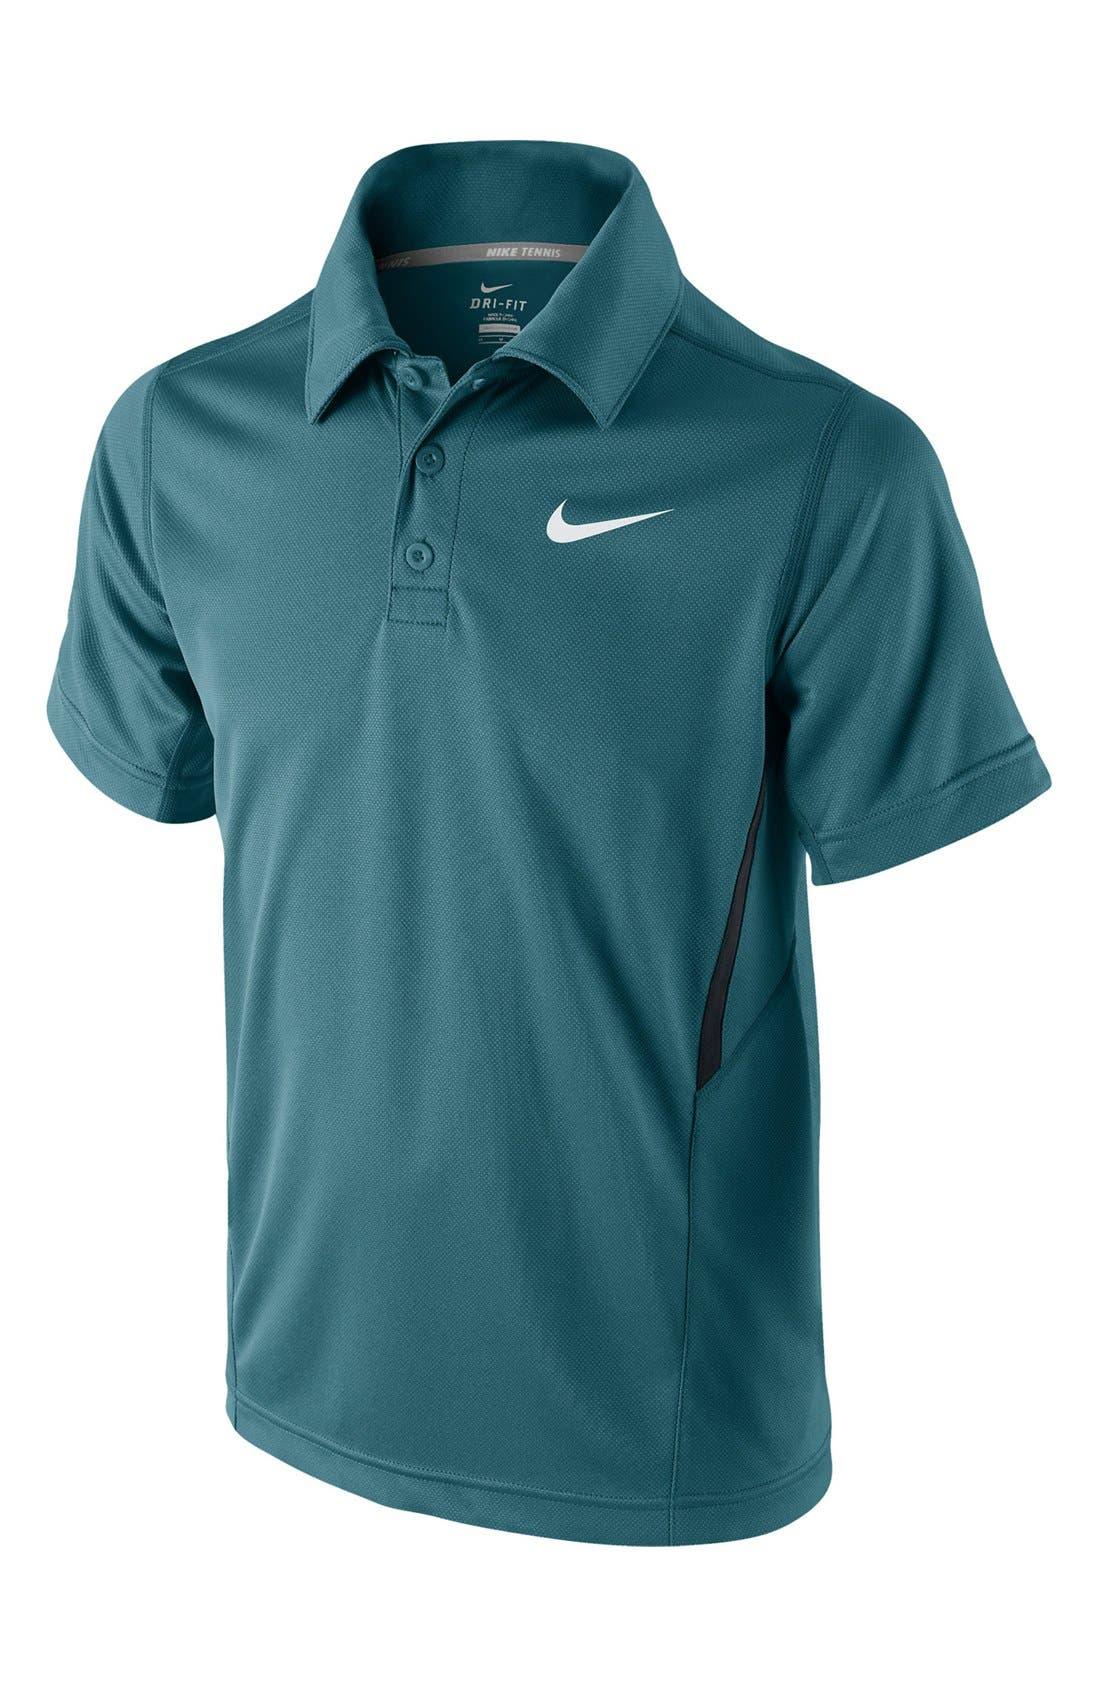 Alternate Image 1 Selected - Nike 'Boarder' Tennis Polo (Big Boys)